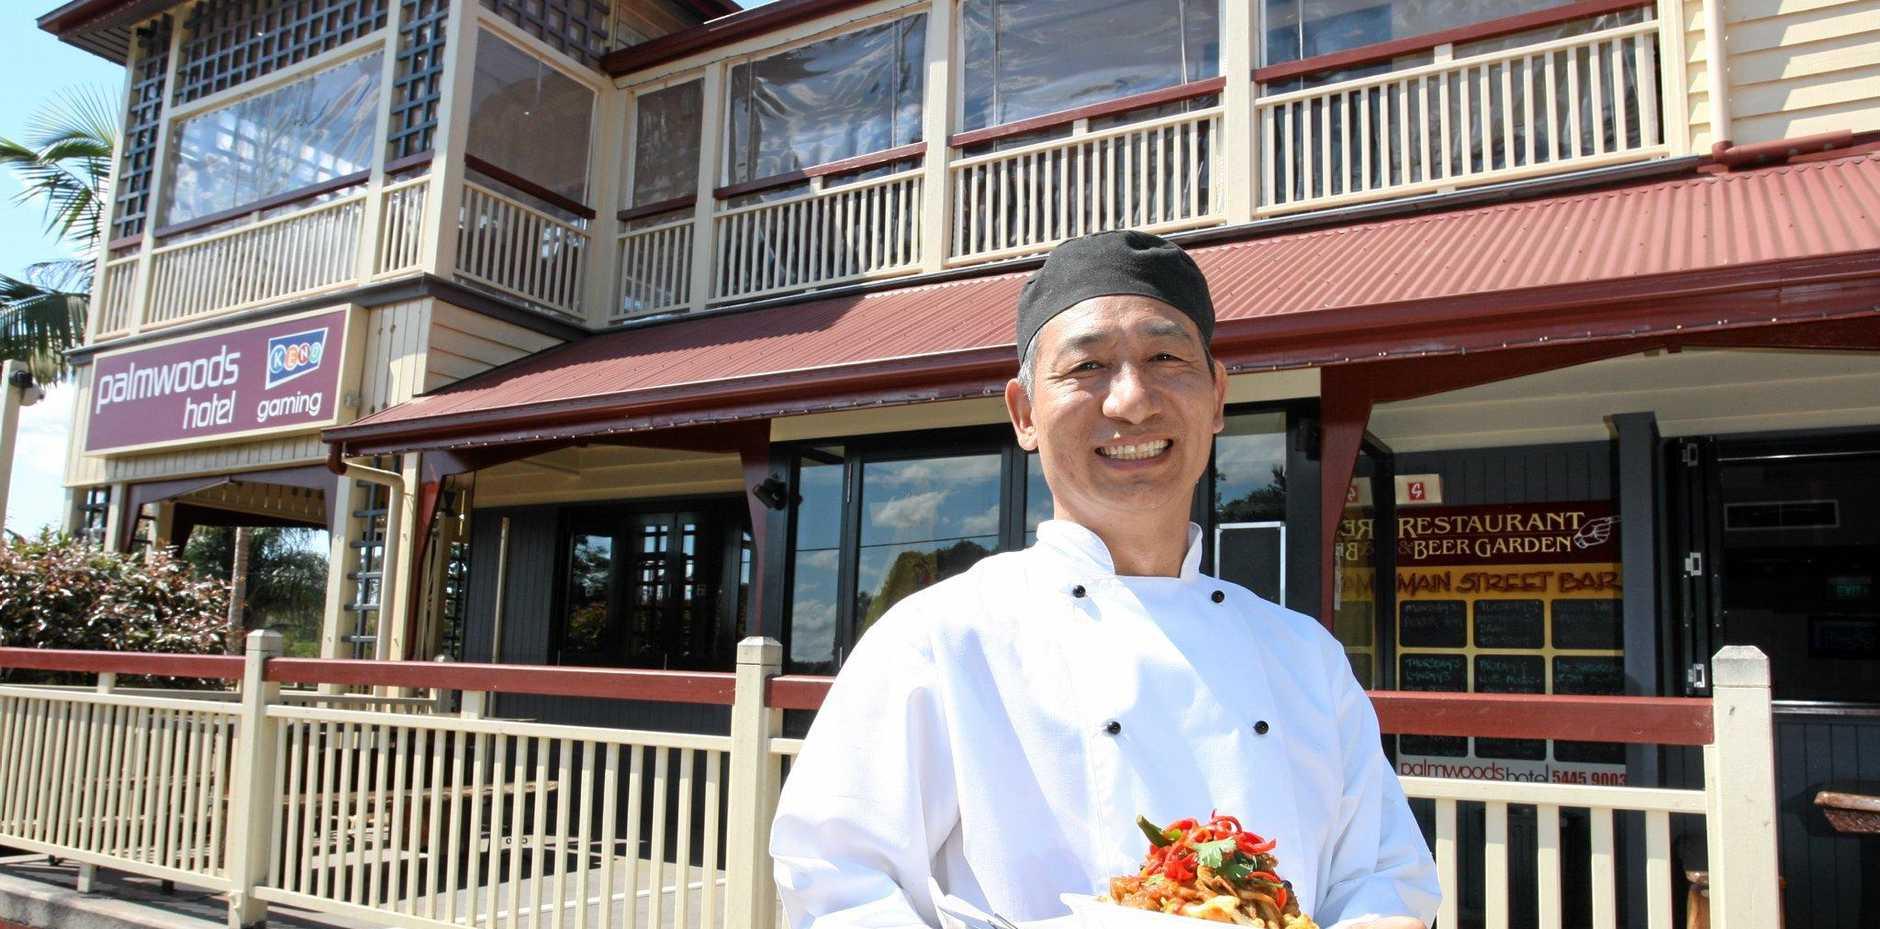 Tibetan chef Jampa Jampa, who hosted Tibetan nights at Palmwoods Hotel in 2012.